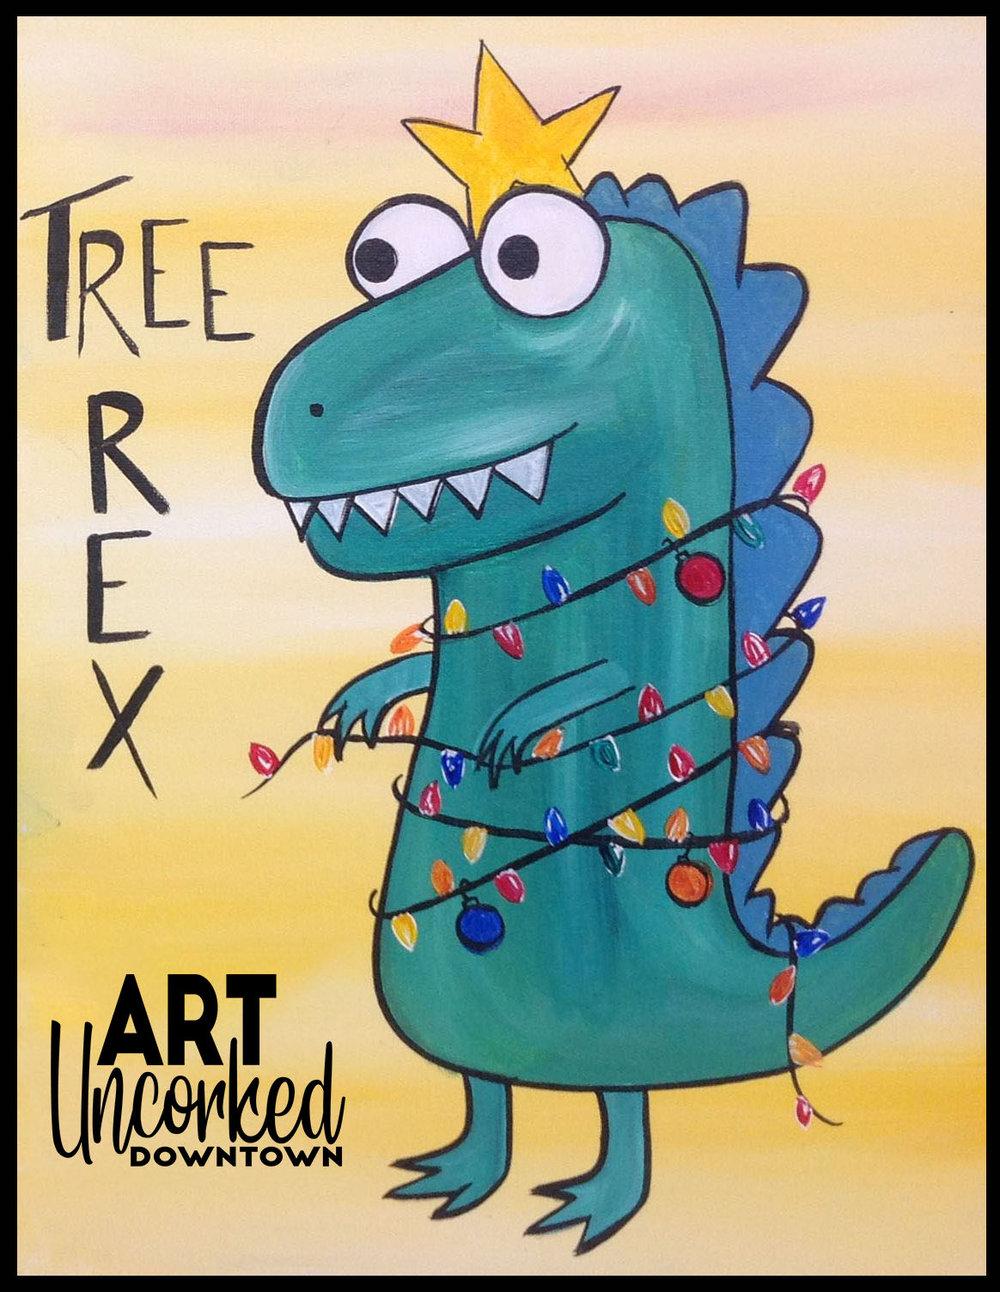 winter tree rex (2).jpg